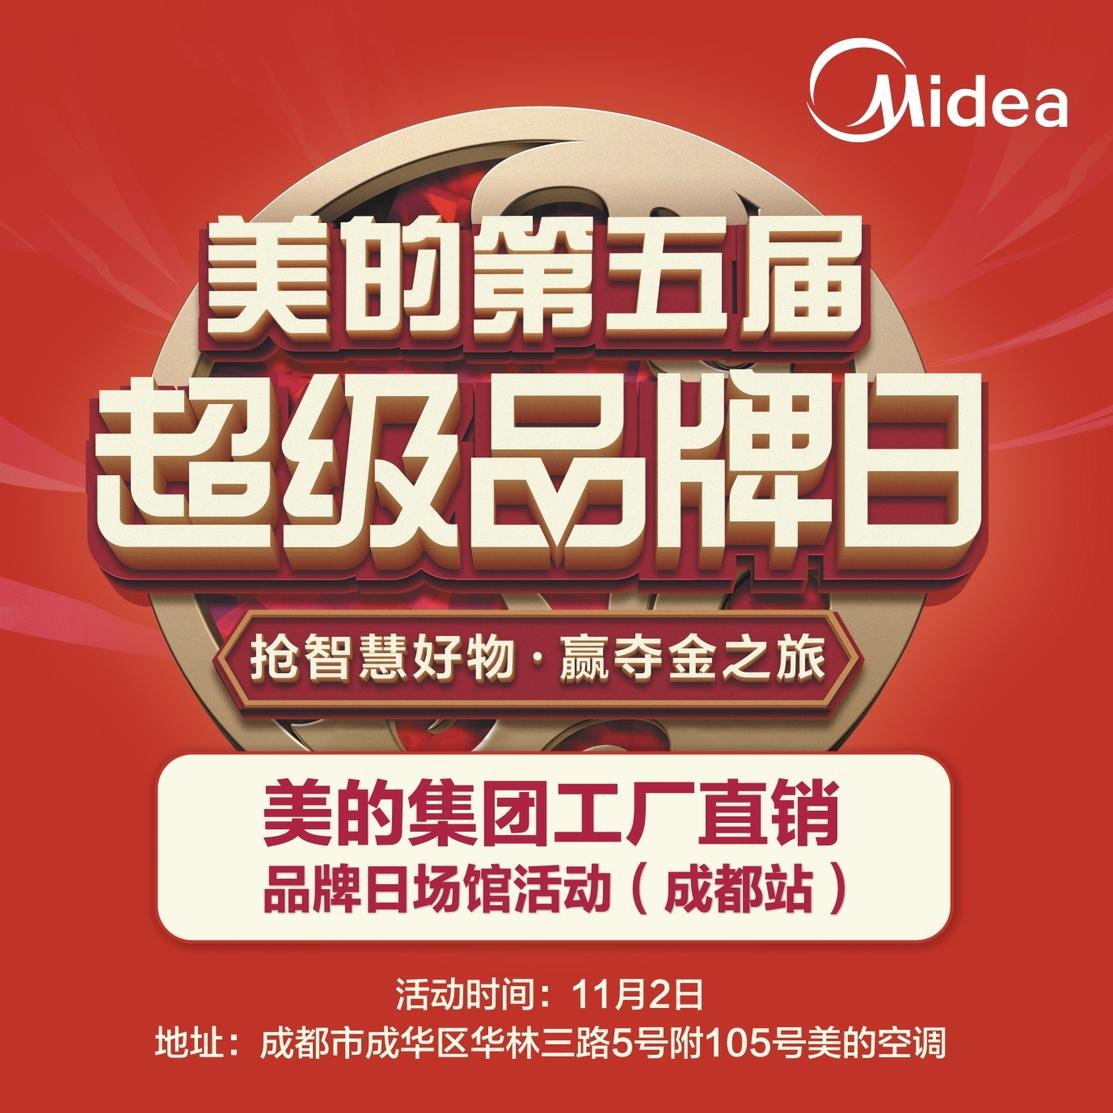 vwin app第五届| 超级品牌日场馆活动(成都站)圆满落幕